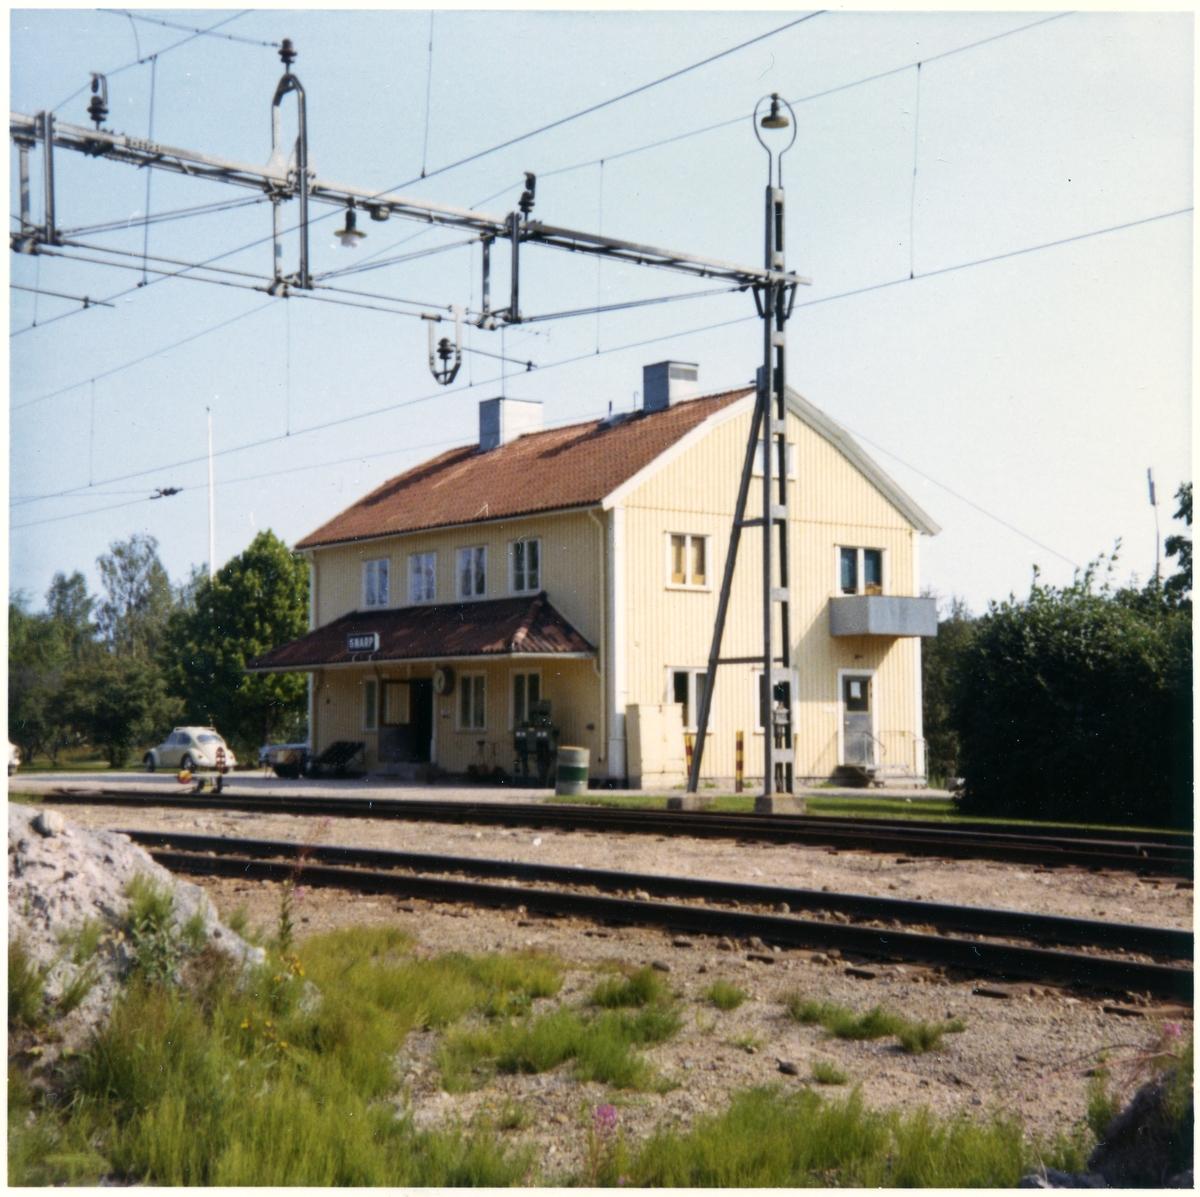 Gnarp station.